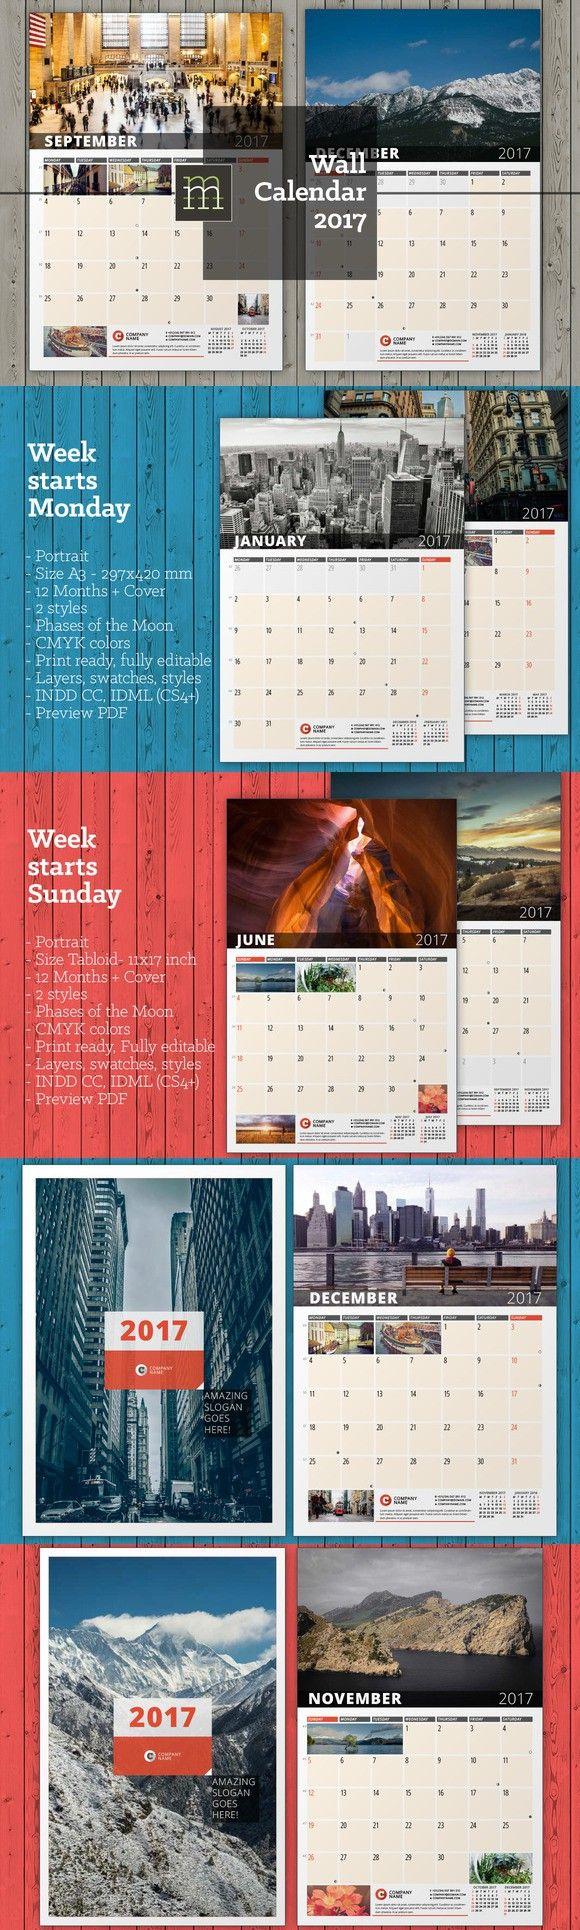 Wall Calendar 2017 (WC19)